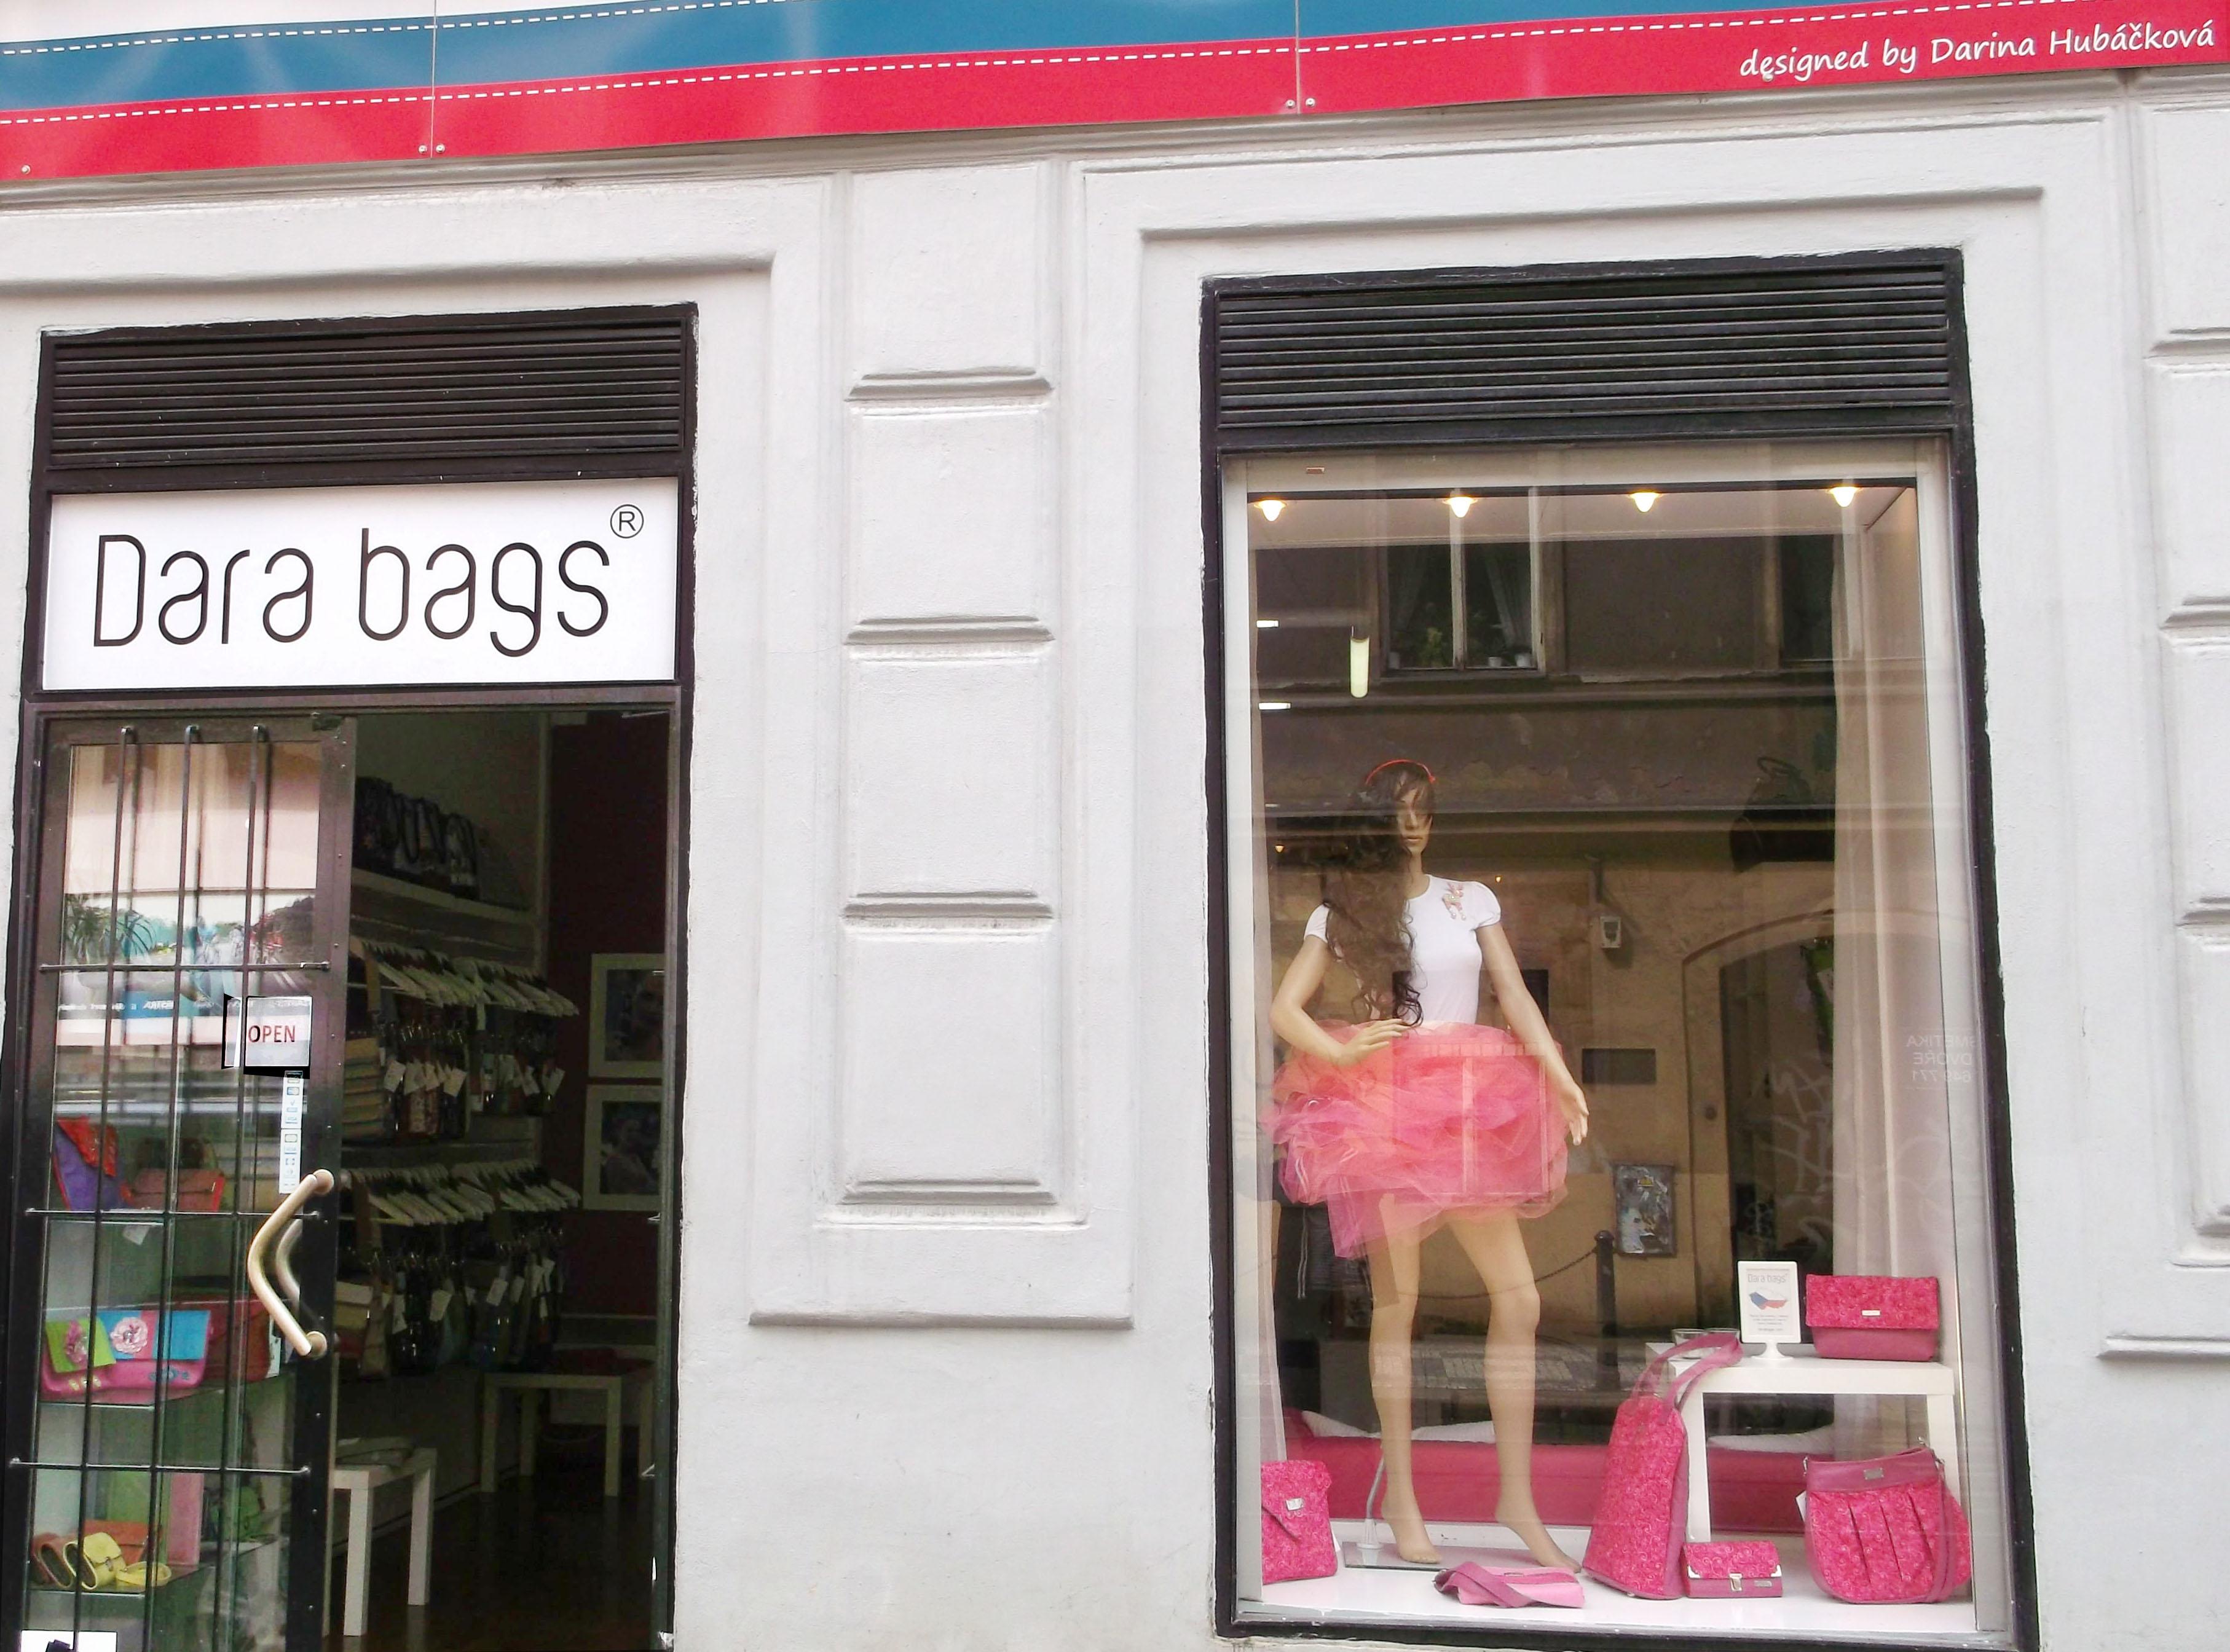 Dara bags - obchod